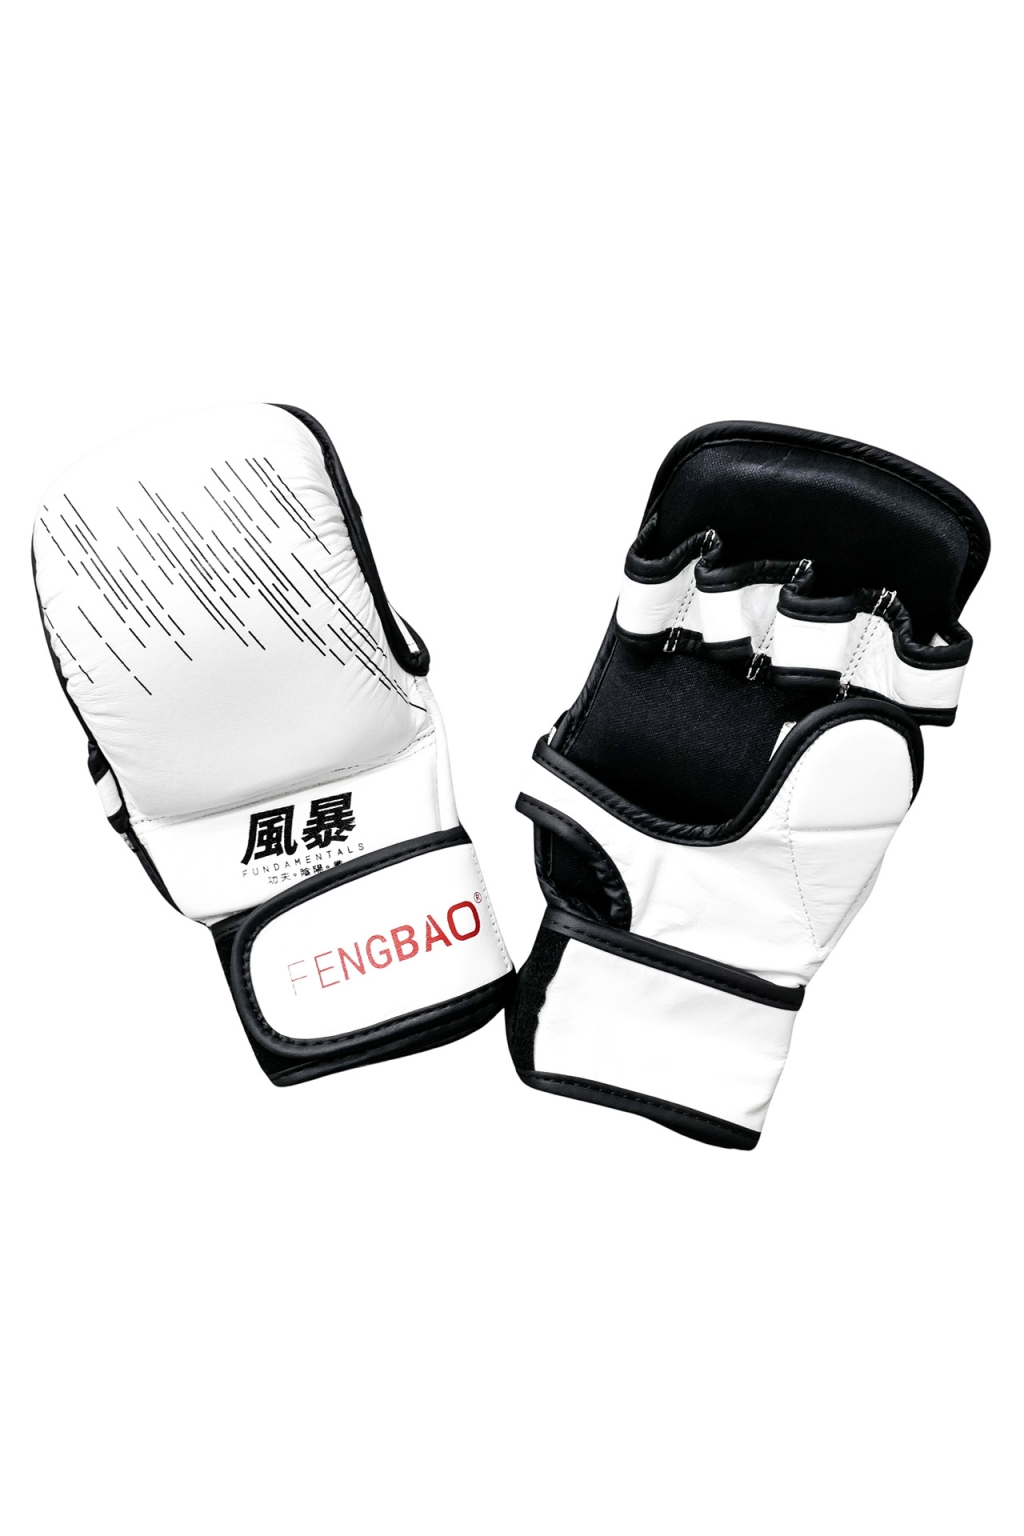 fengbao kung fu fundamentals mma handschuhe boxen grappling kickboxen weiss shop 1080 squashed